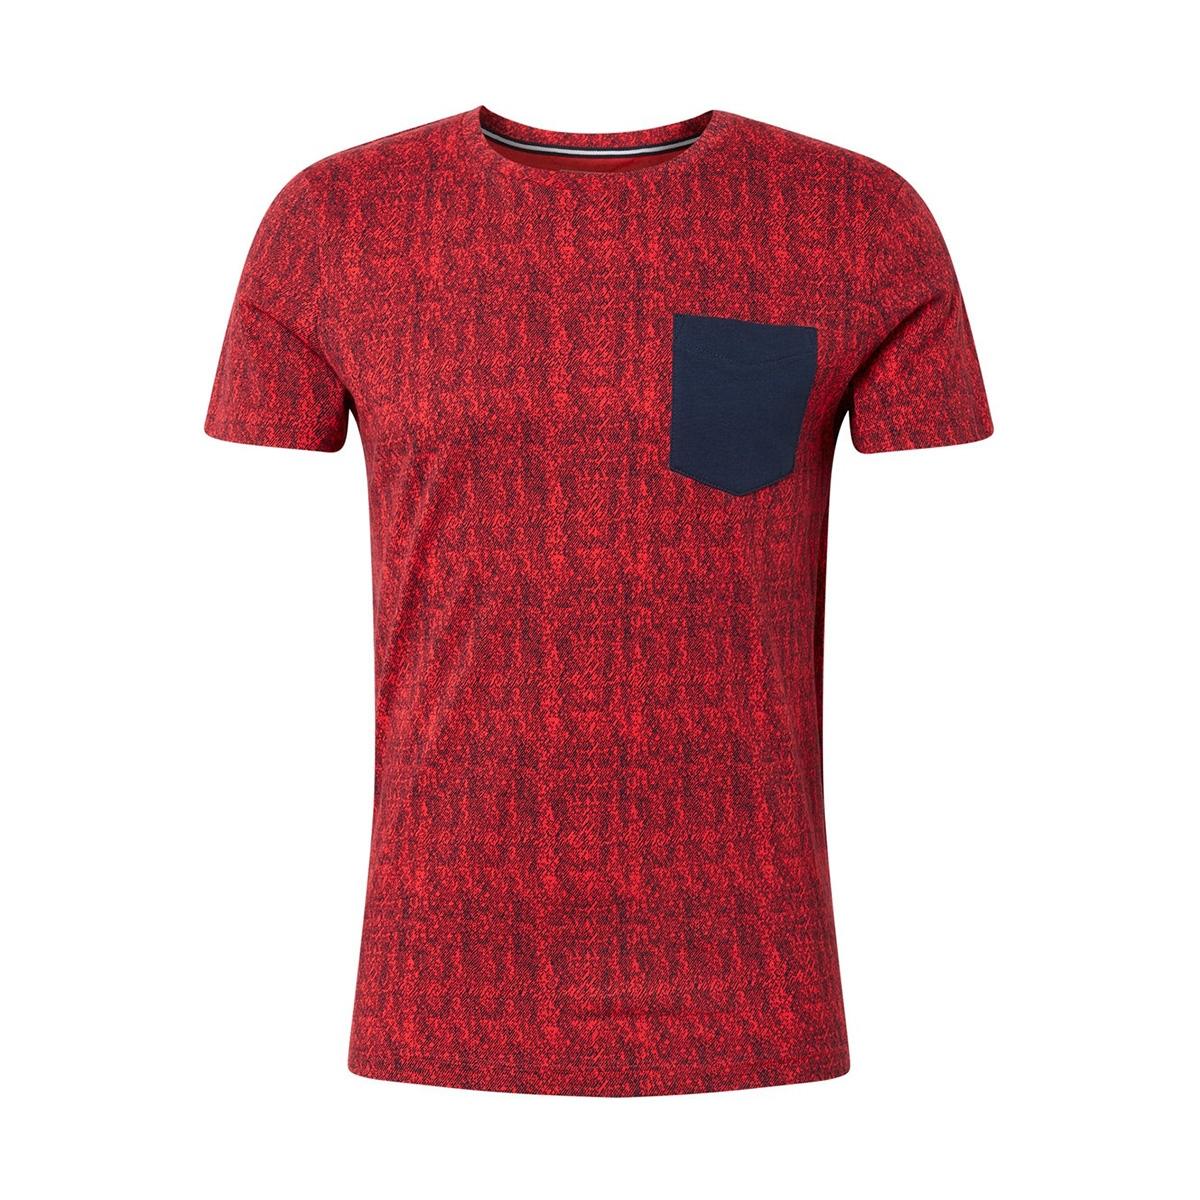 t shirt met borstzak 1013299xx12 tom tailor t-shirt 20434